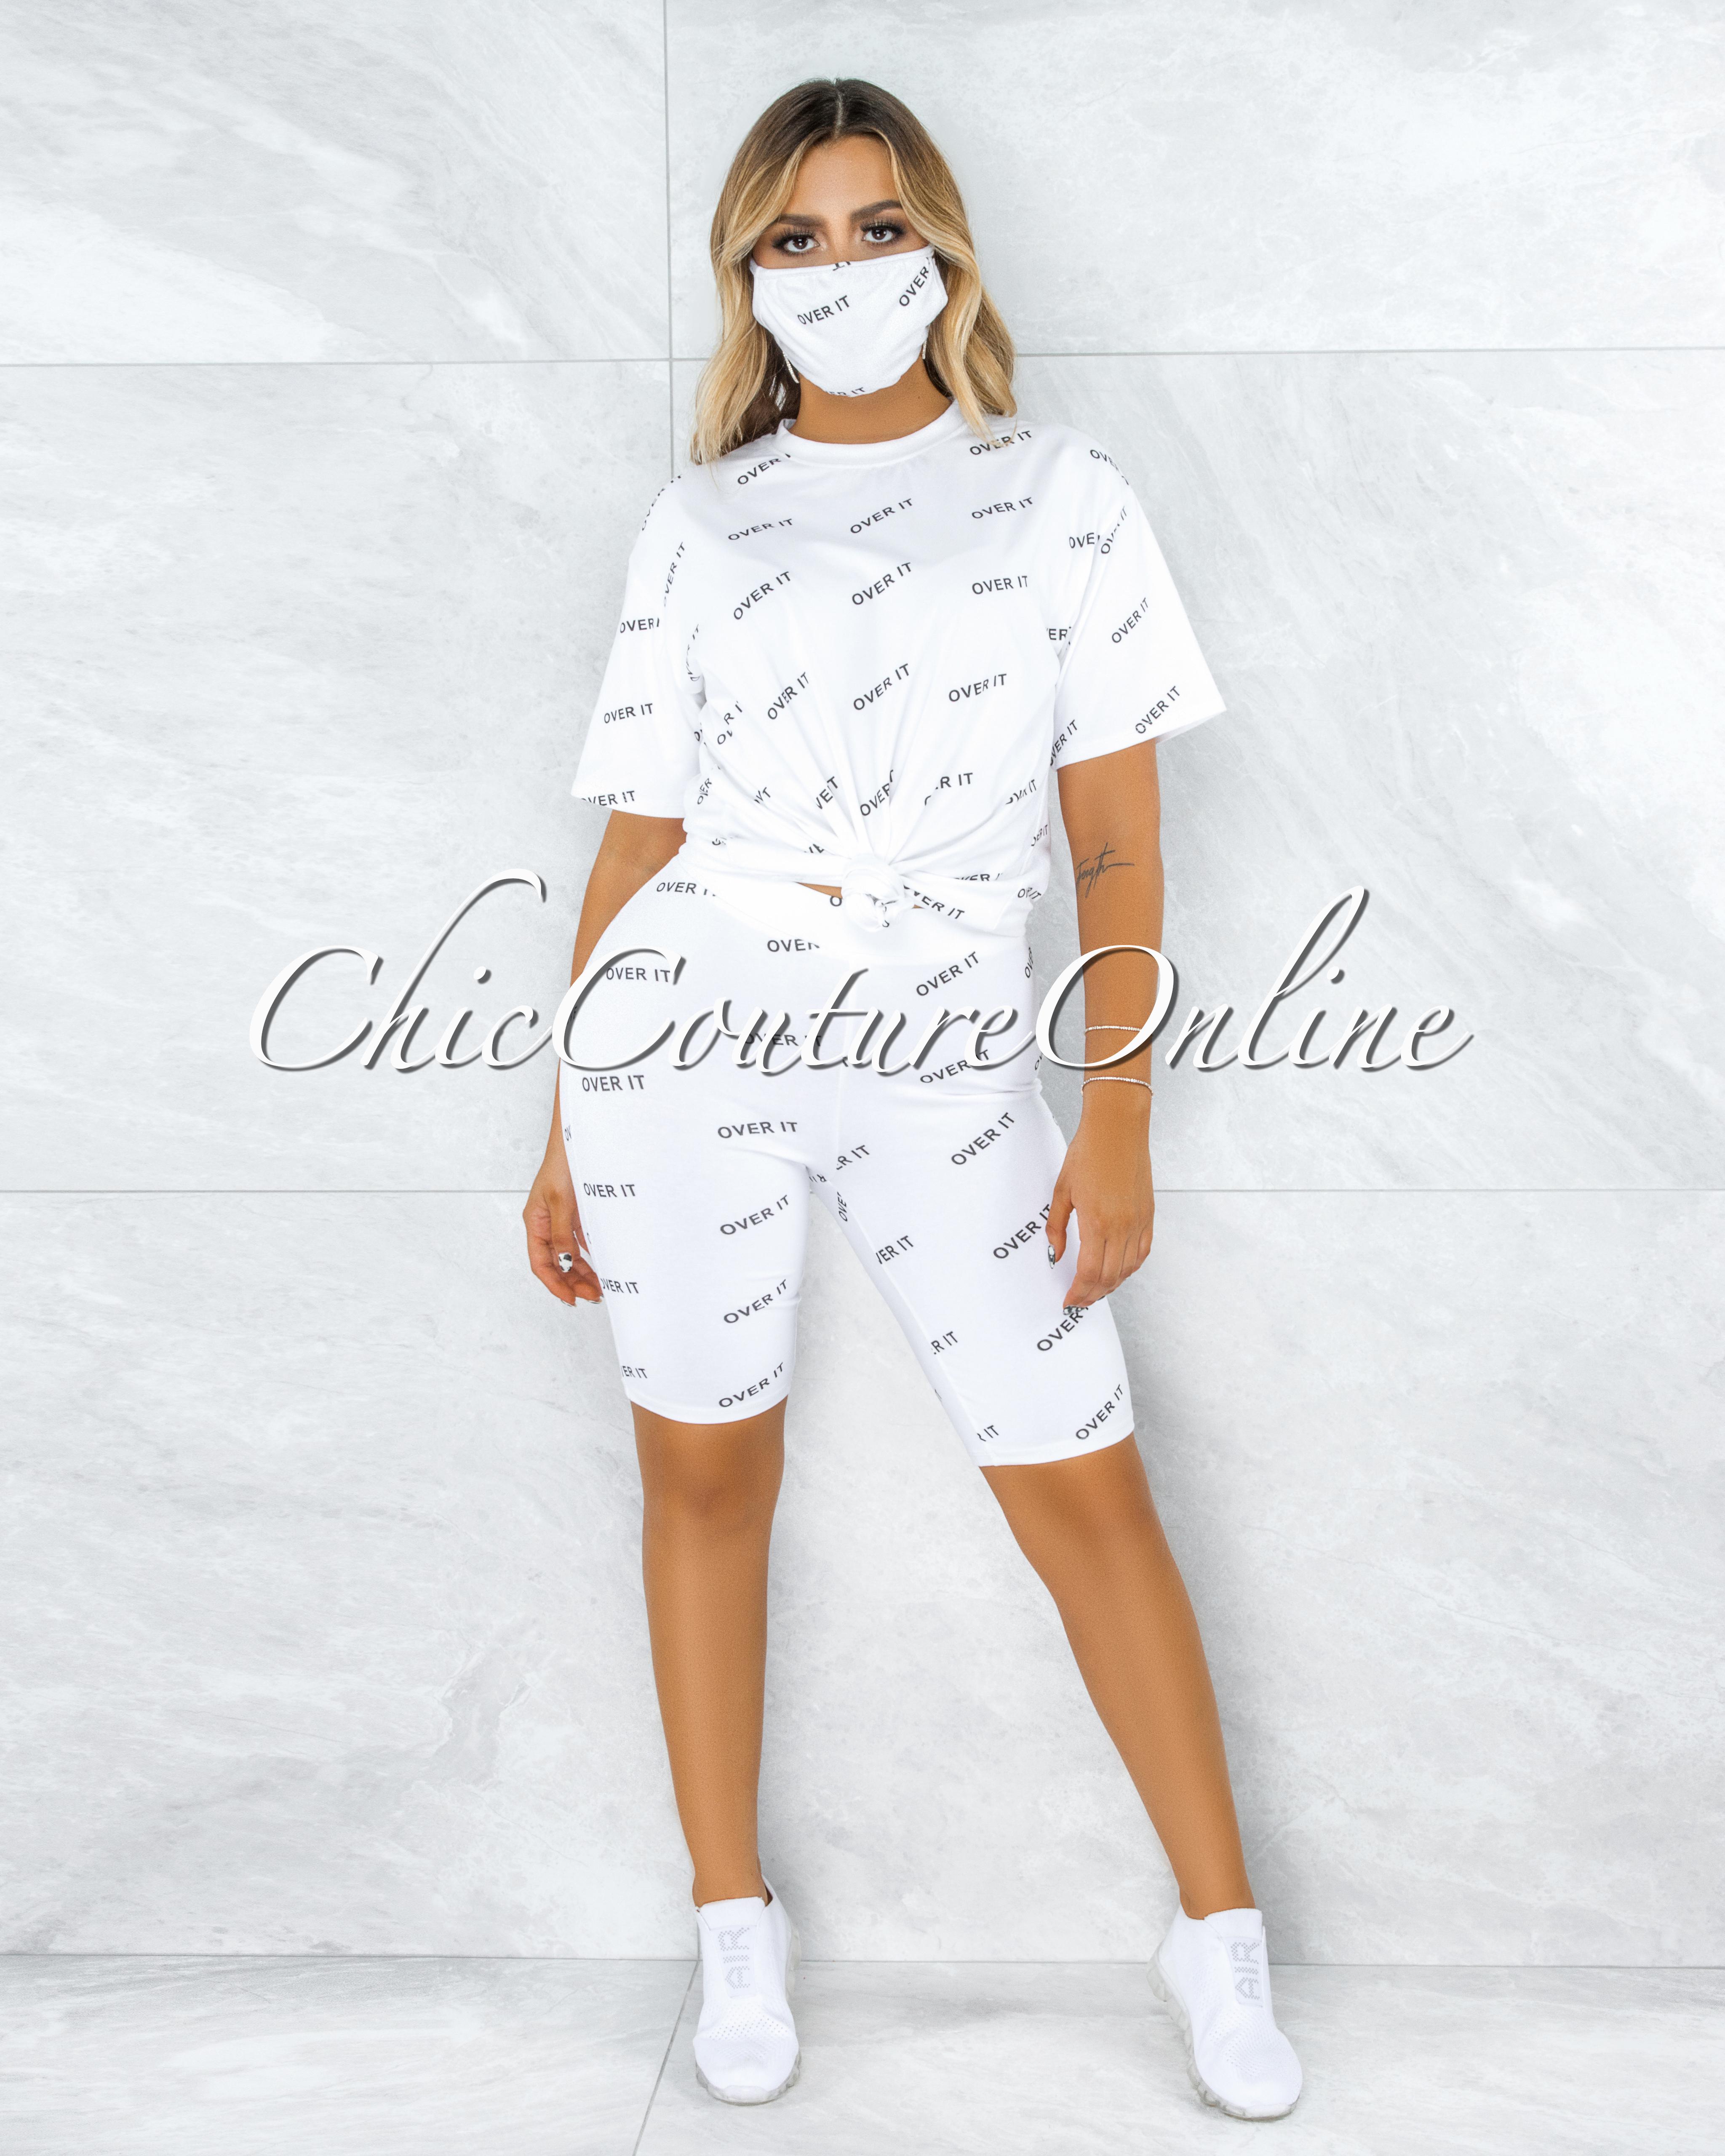 Brunet Off-White Black Graphic Bike Shorts Set w Mask